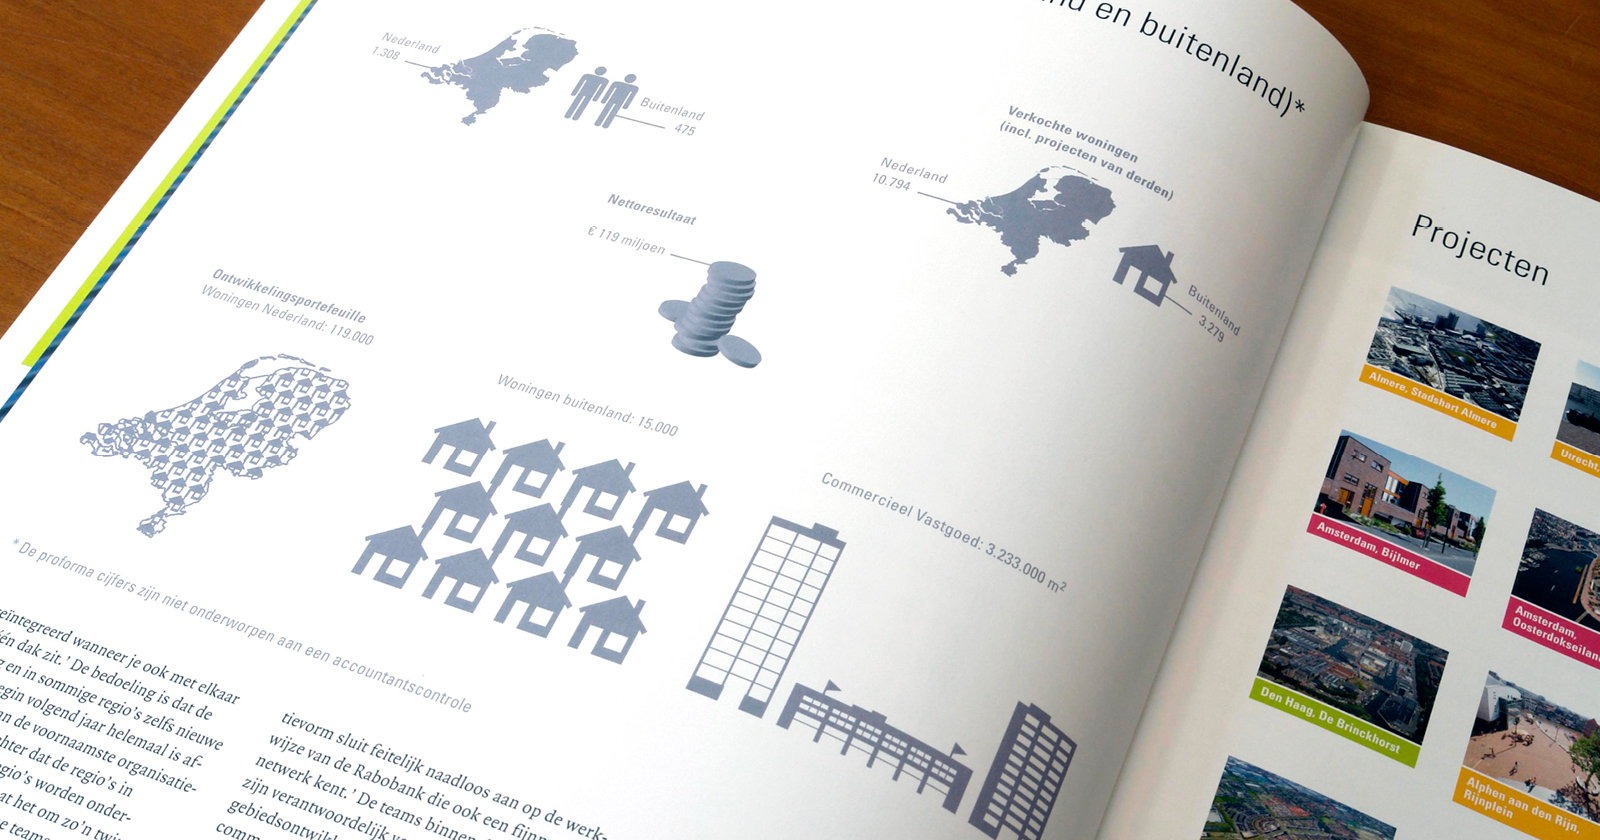 info-cartografics17-Bouwfonds